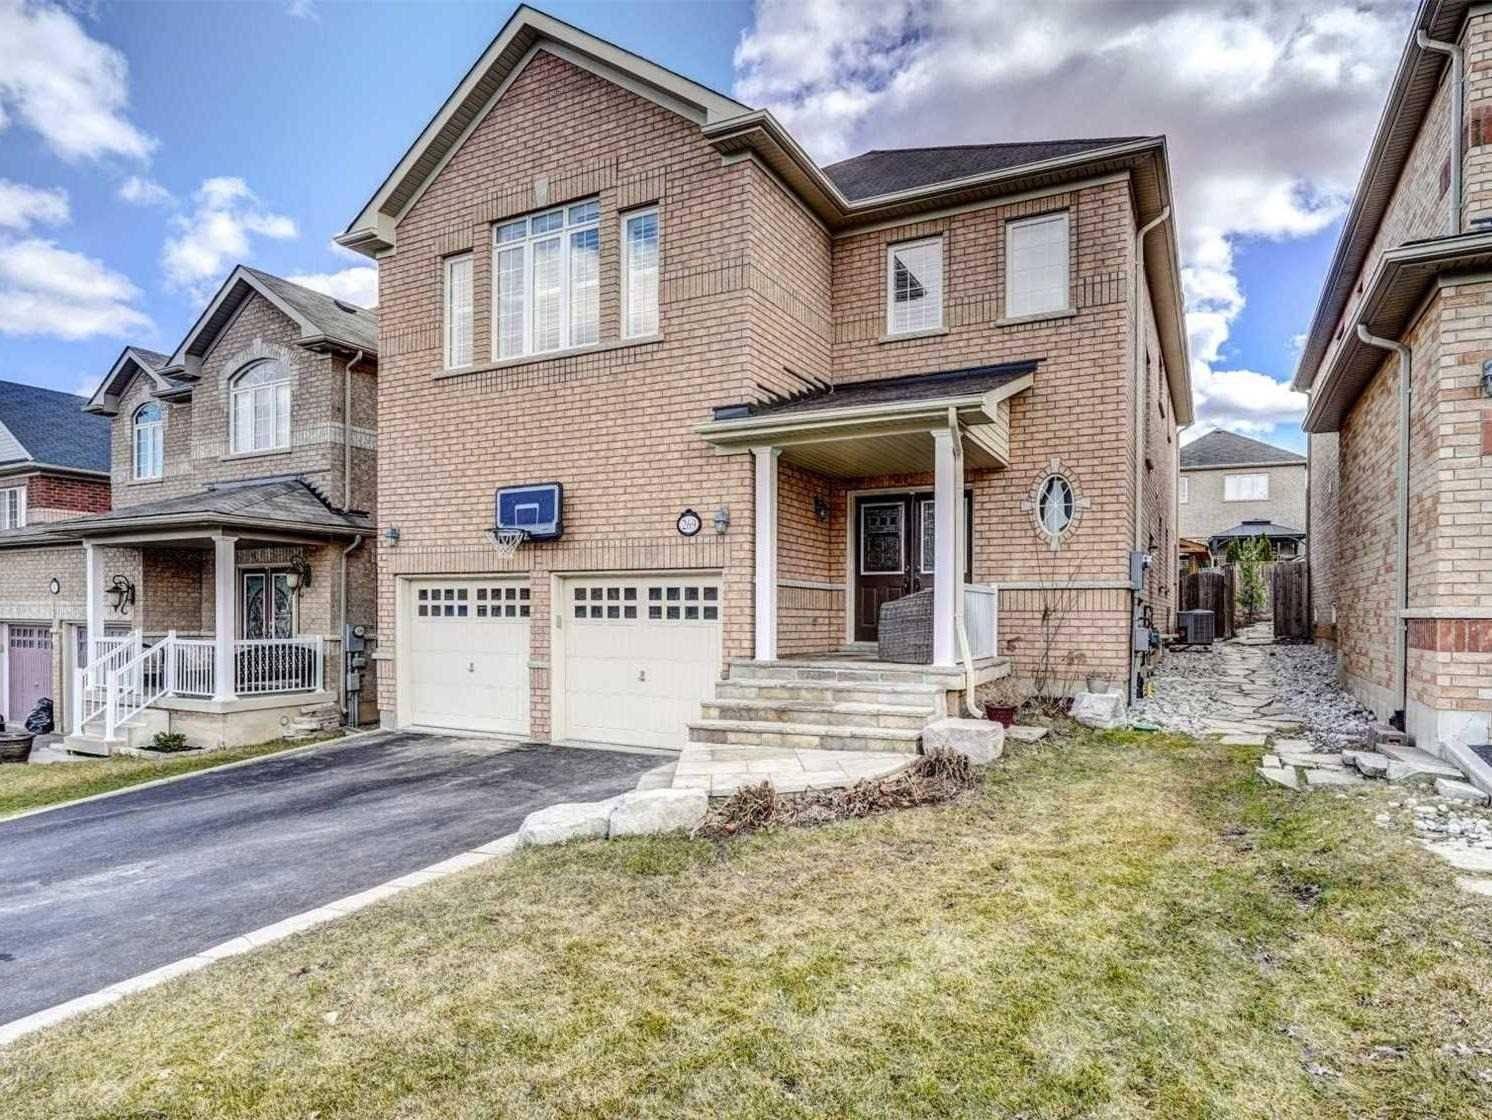 House for sale at 269 Eaton St Halton Hills Ontario - MLS: W4426908